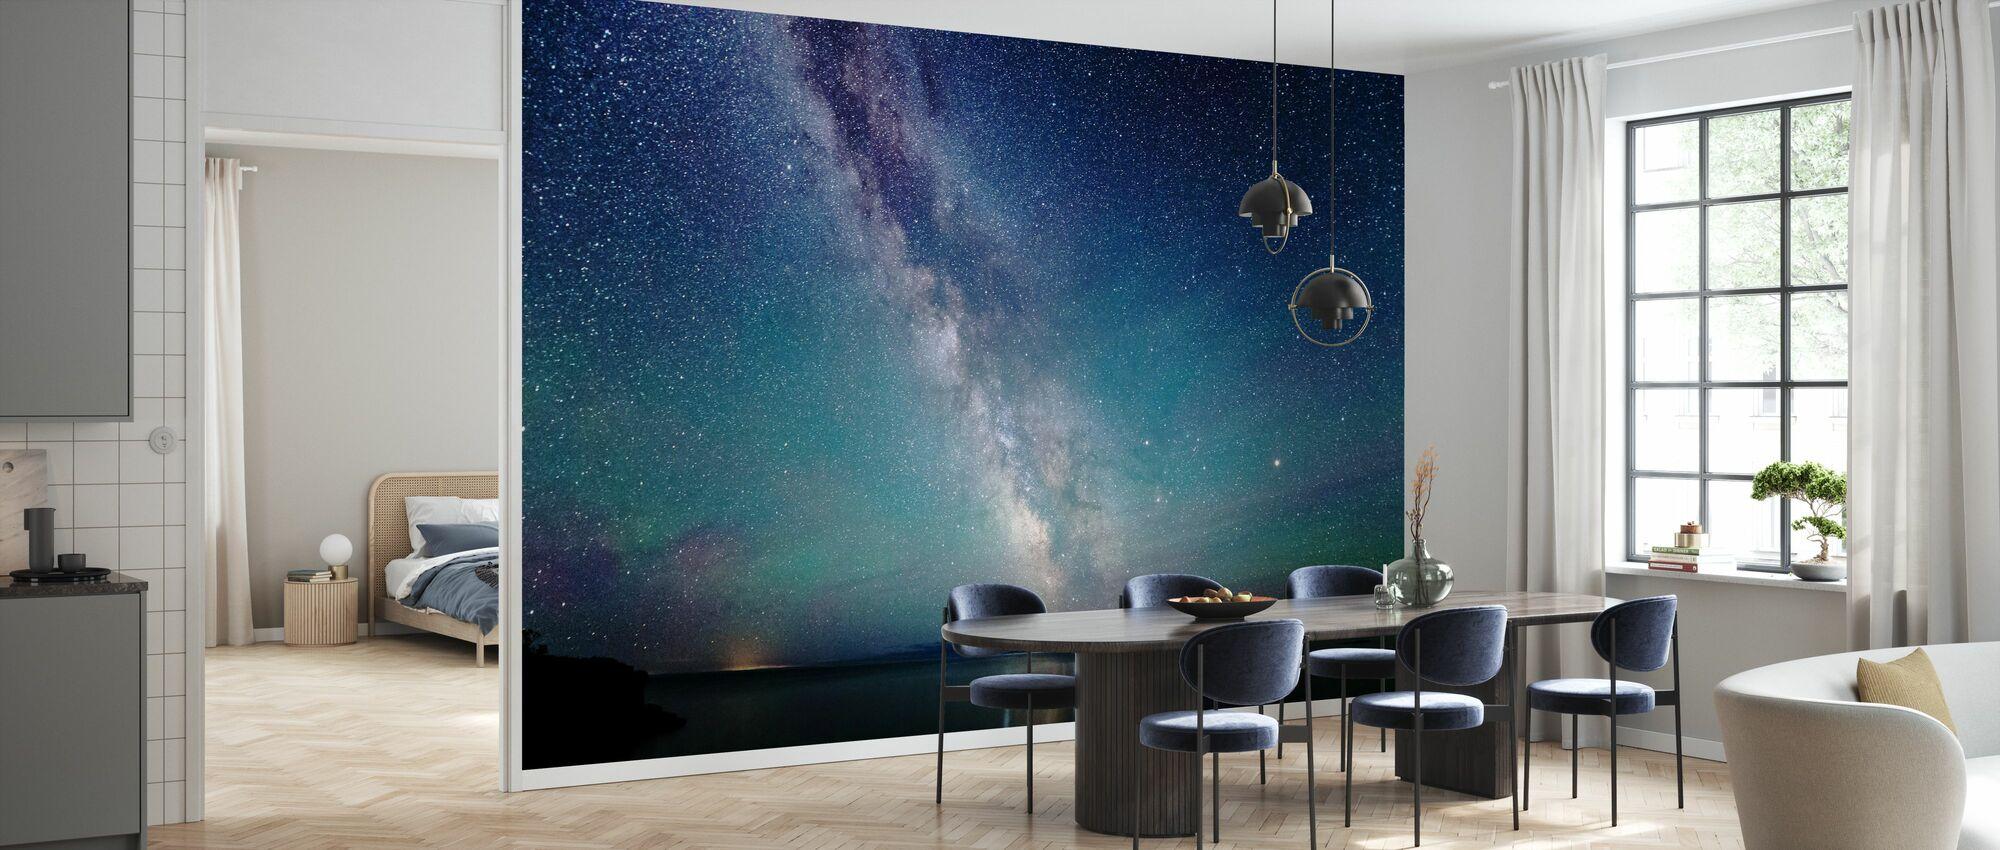 Milky Way Night Sky - Wallpaper - Kitchen